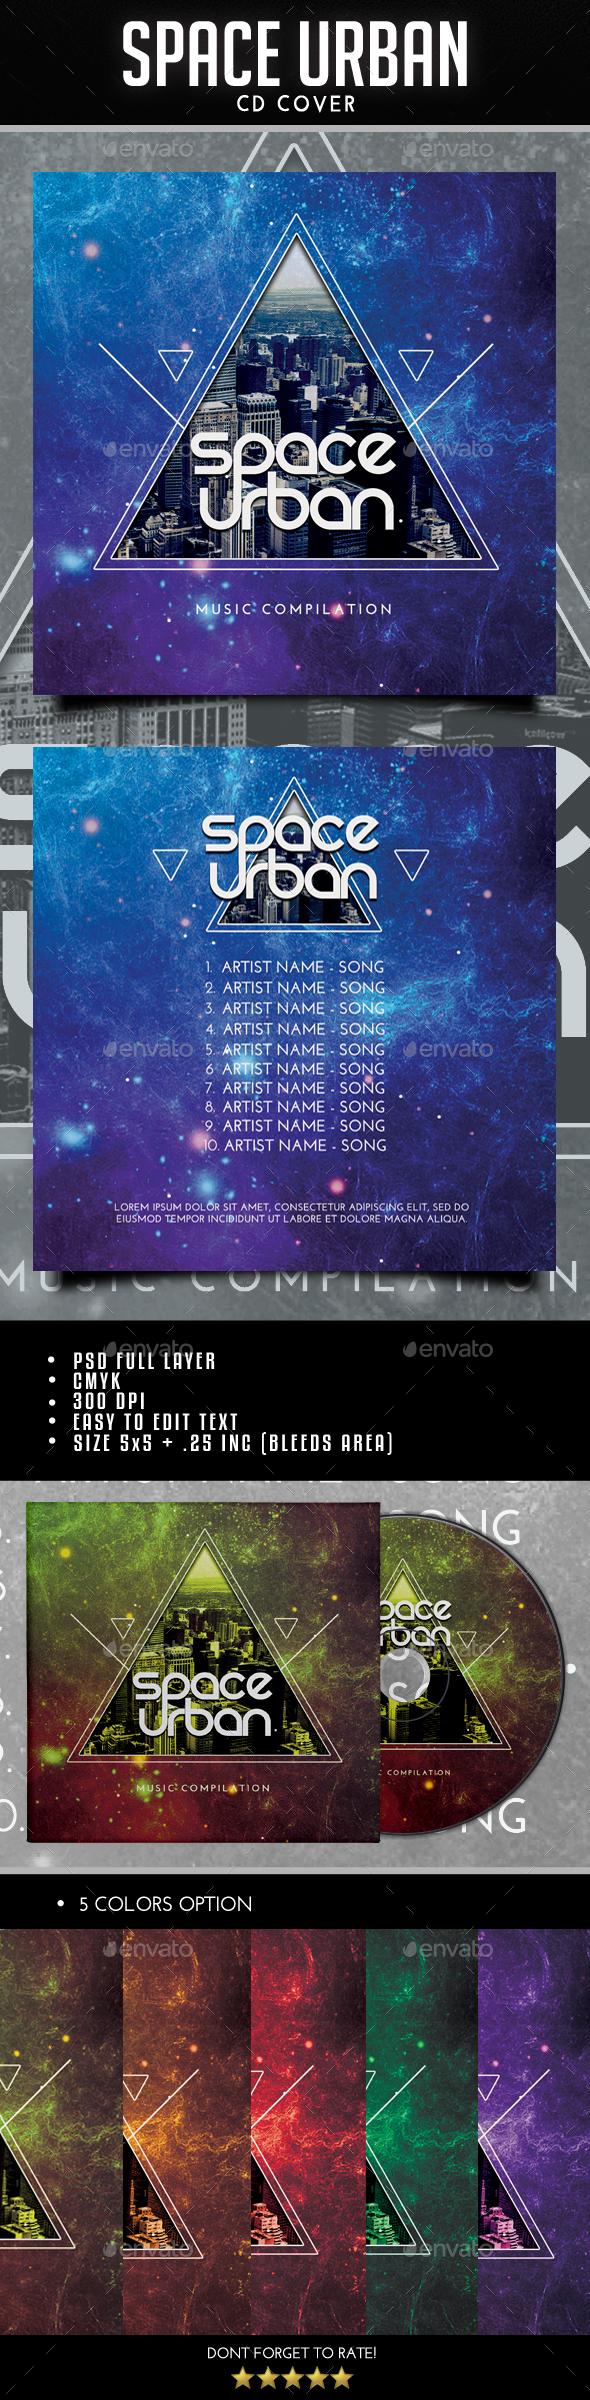 Space Urban CD Cover - CD & DVD Artwork Print Templates